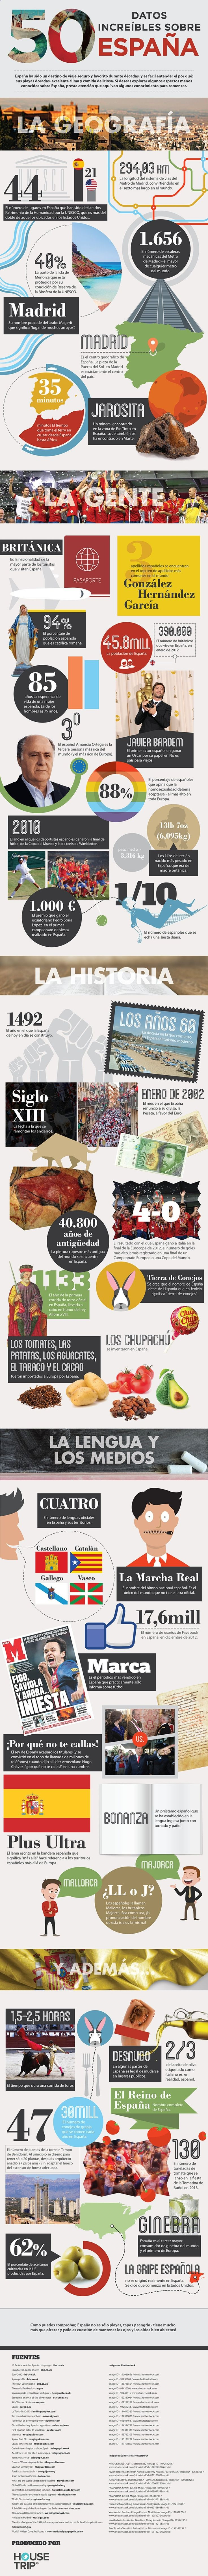 50 cosas por las que España is different (Infografía de HouseTrip.es vía The Huffington Post).